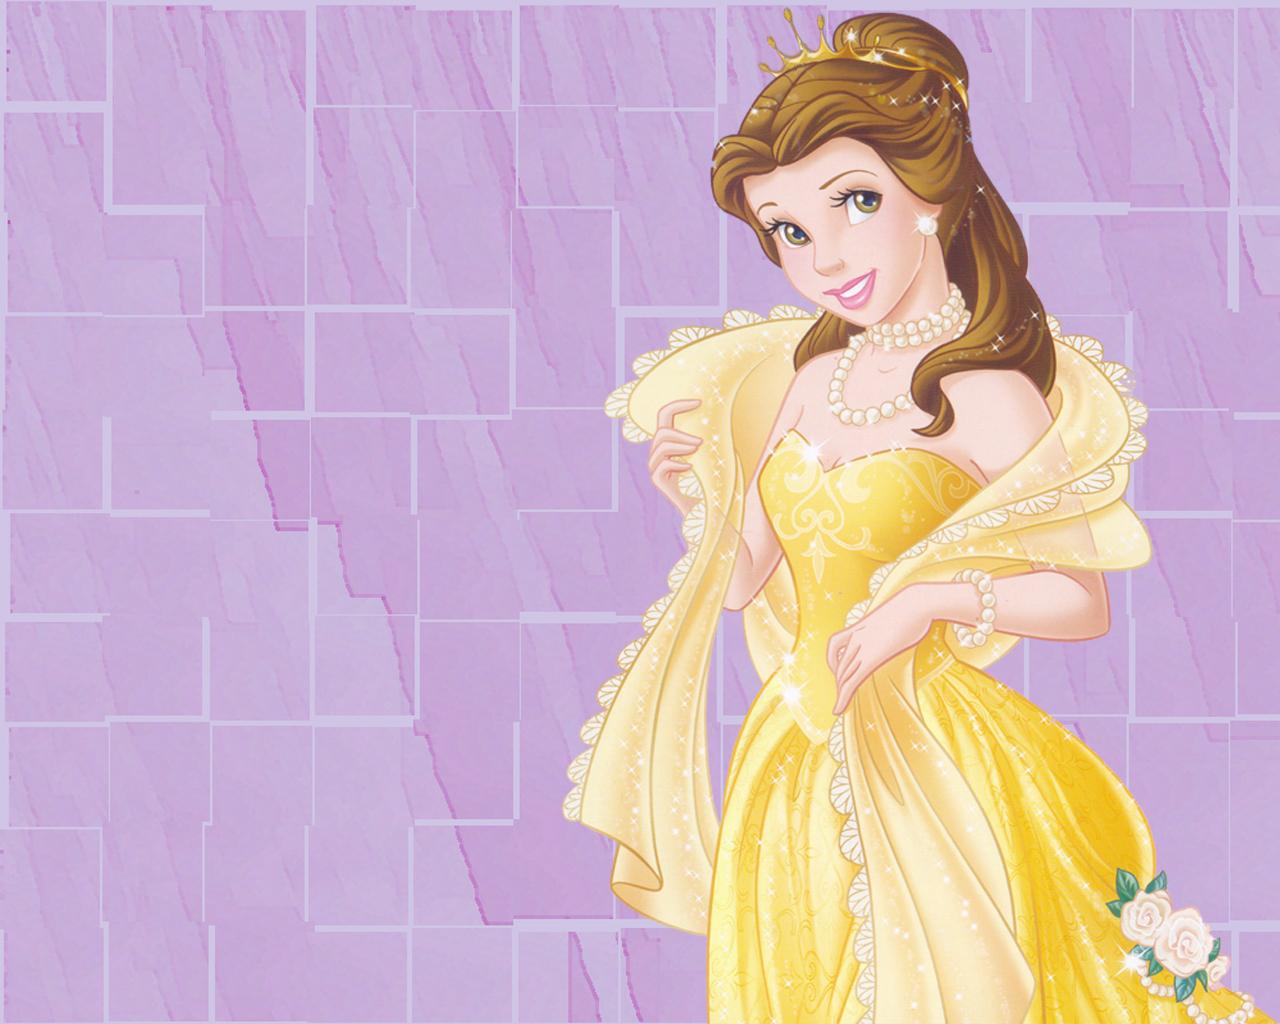 disney princess hot - photo #26